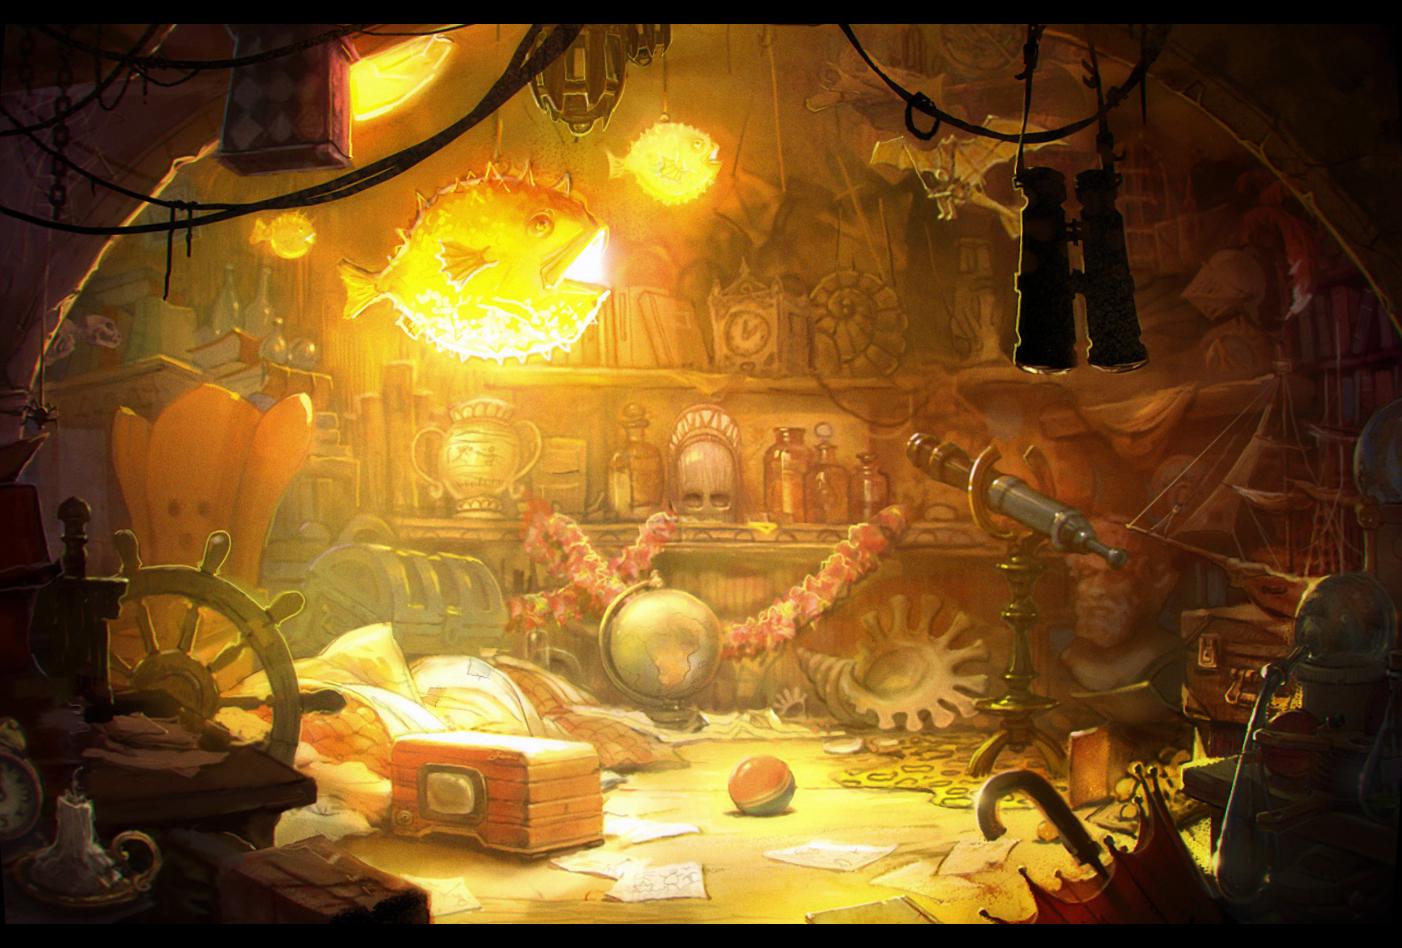 Registro de Vivienda - Página 6 Little_adventurer__s_treasure_room_by_tulinovr-d4f9j1s